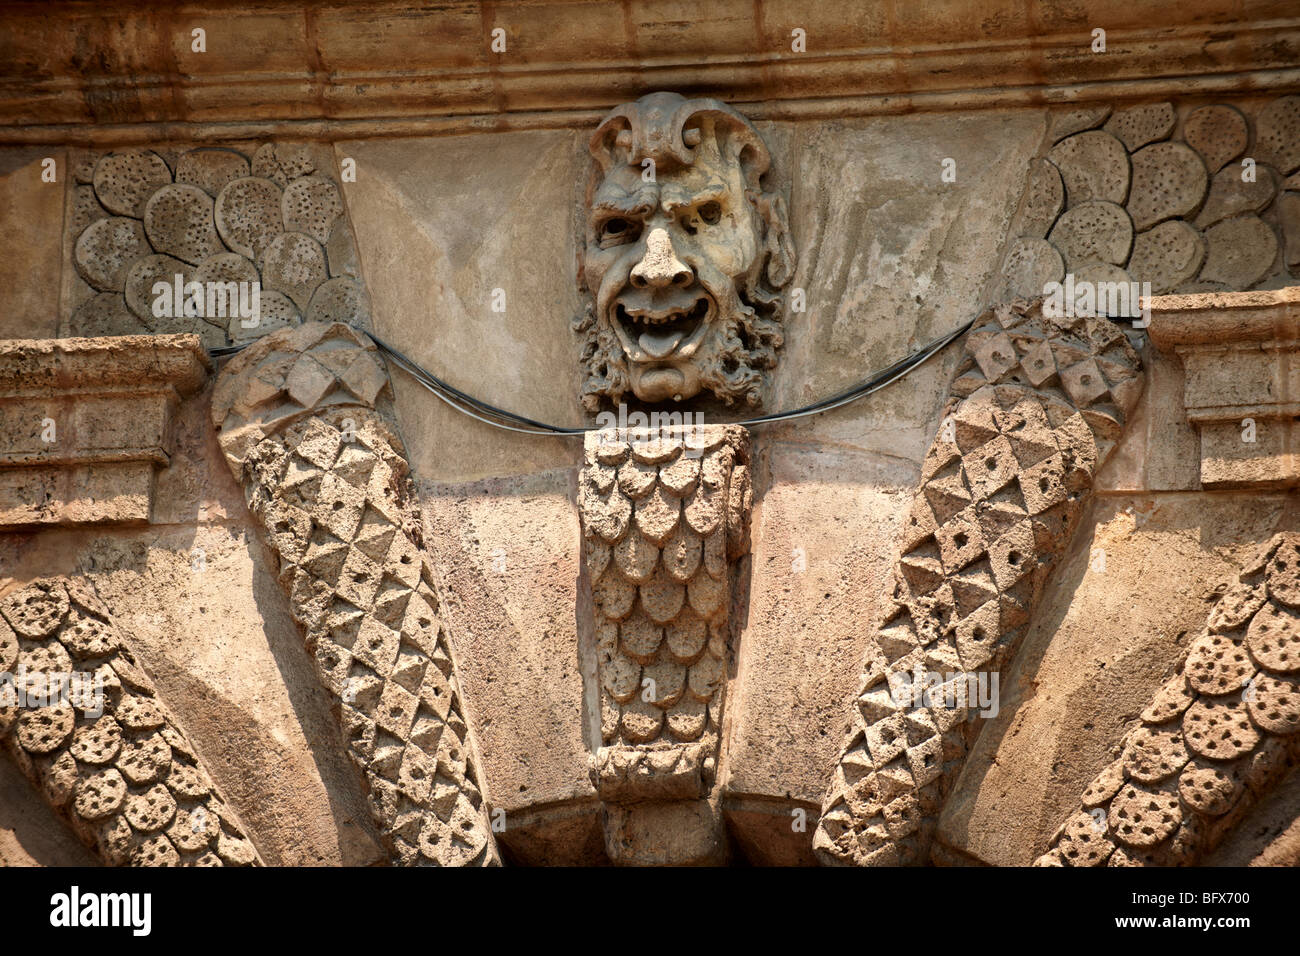 POTA Nuova Bogen Skulpturen, architektonische Dekoration, Palermo Sizilien Stockbild